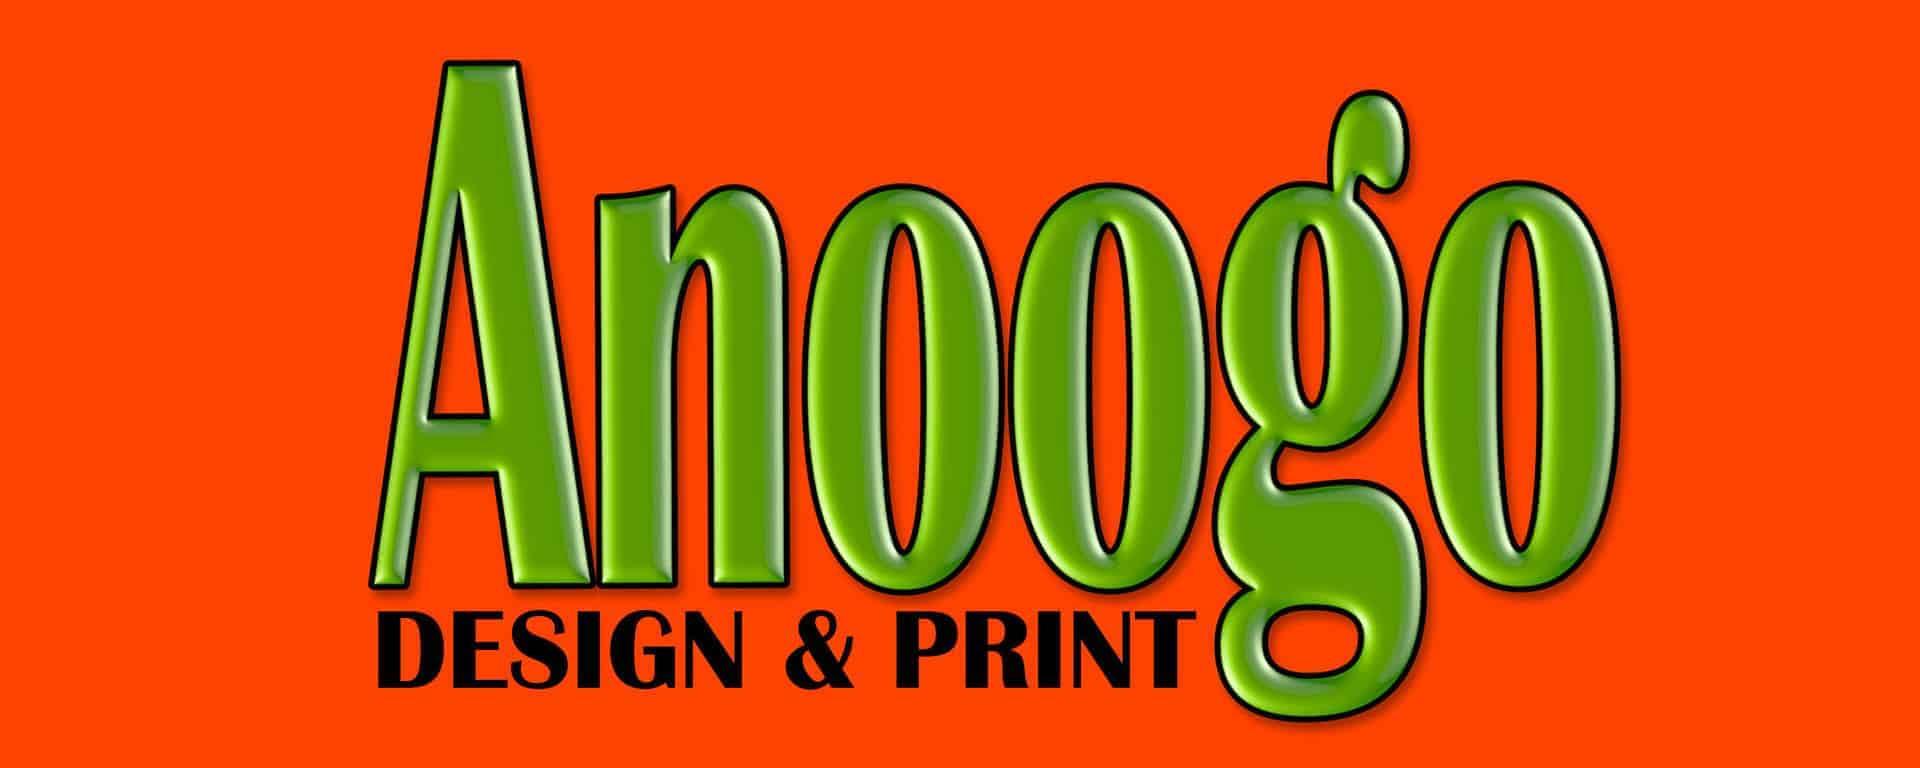 Anoogo Shop